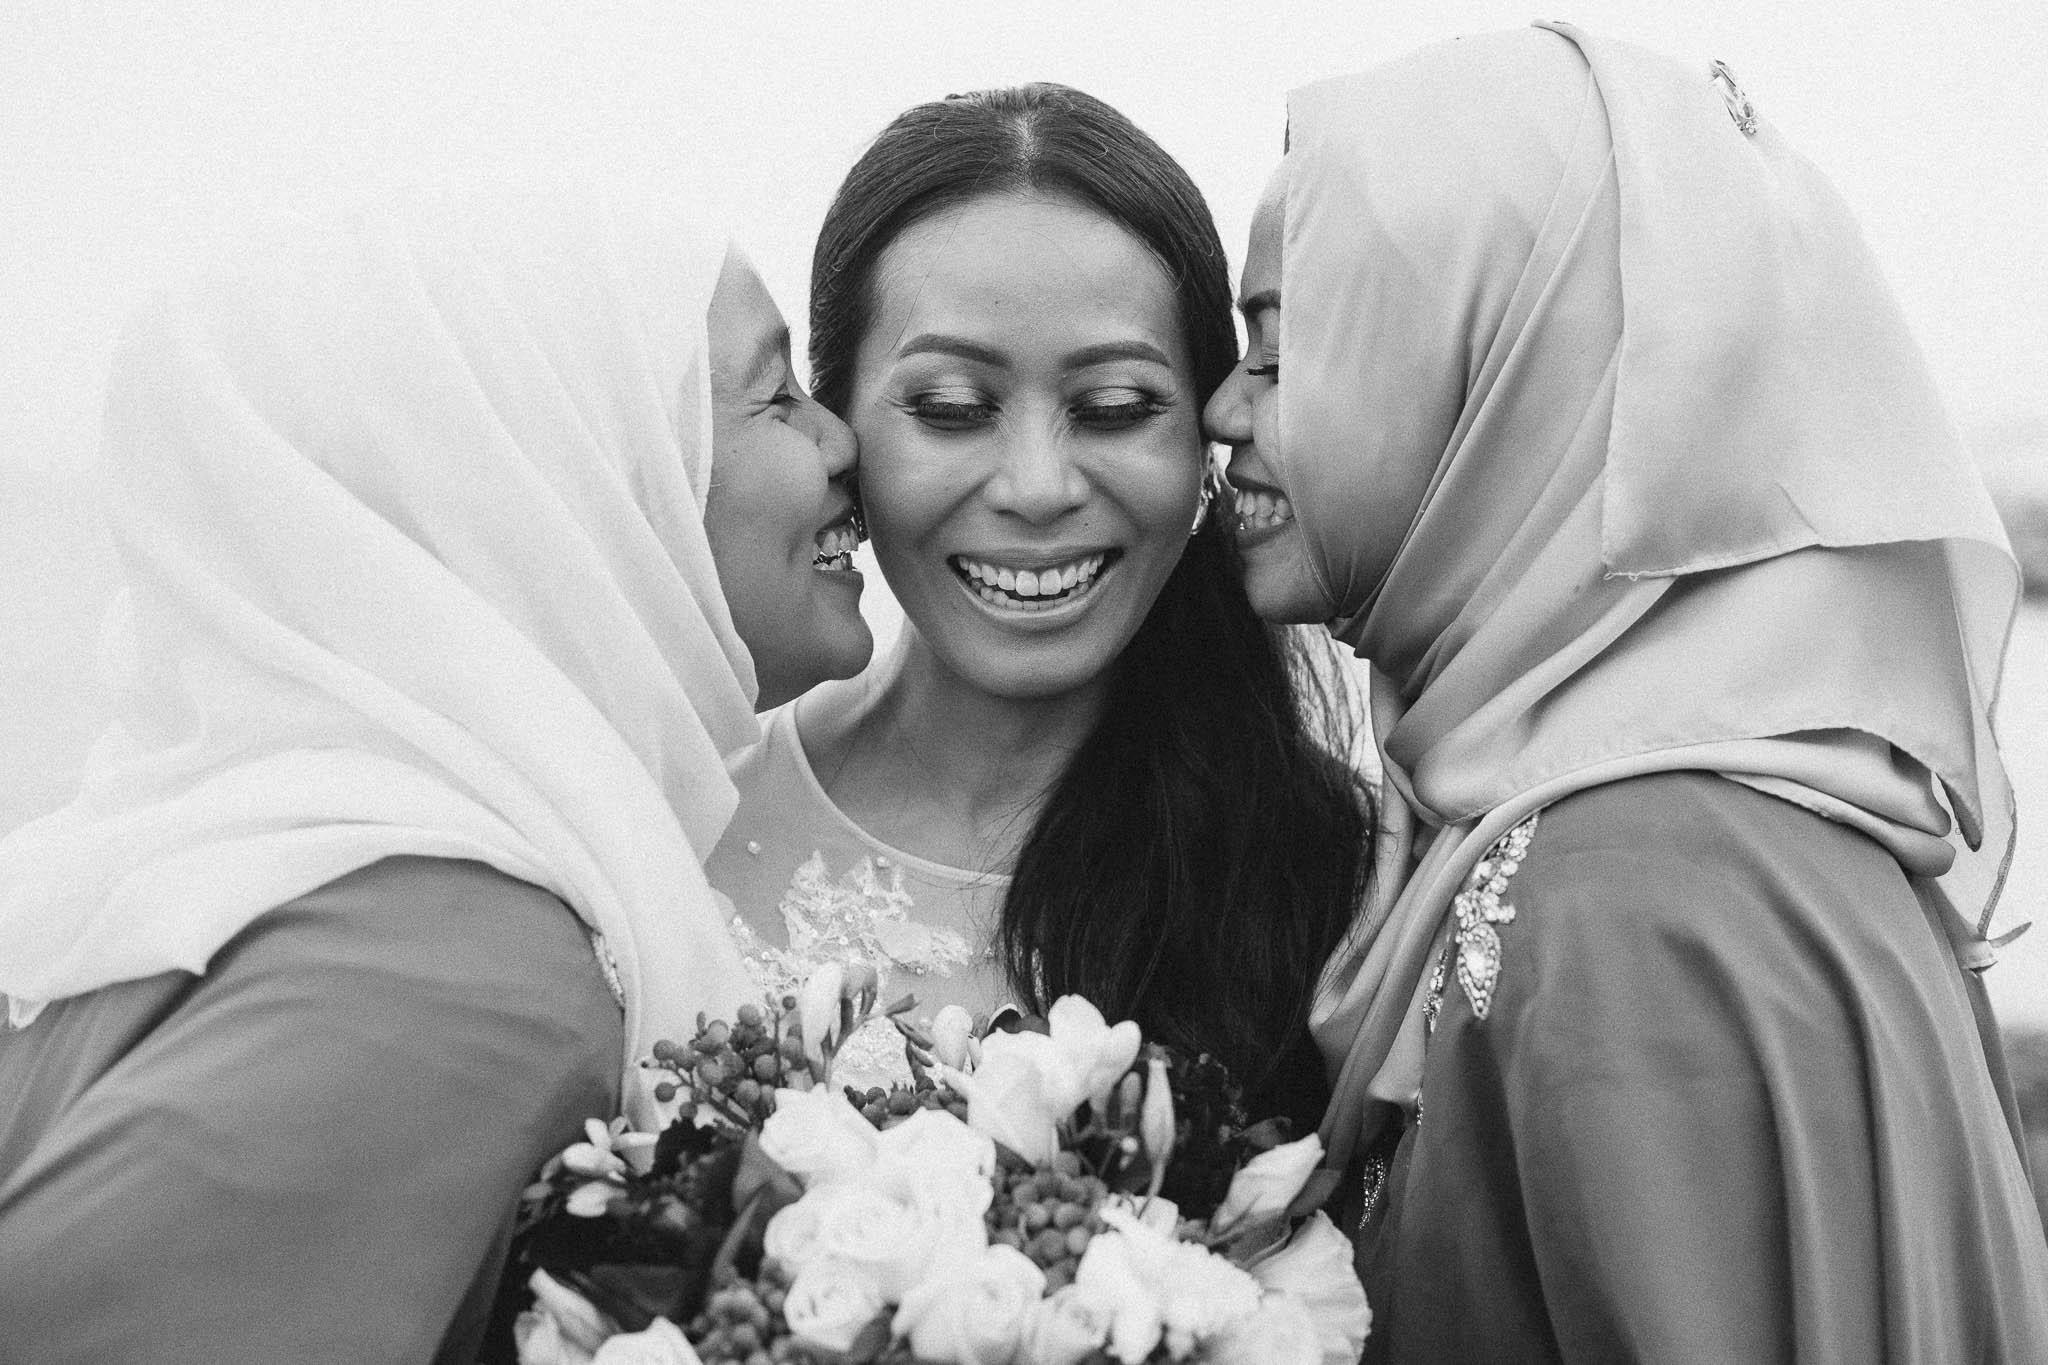 singapore-wedding-photographer-malay-indian-pre-wedding-travel-wmt-2015-76.jpg